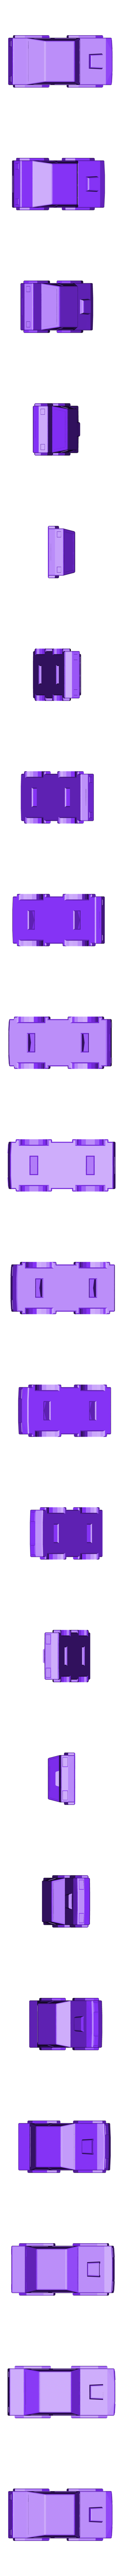 SmallToys-MustangBody.stl Download STL file SmallToys - Cars pack • 3D print design, Wabby